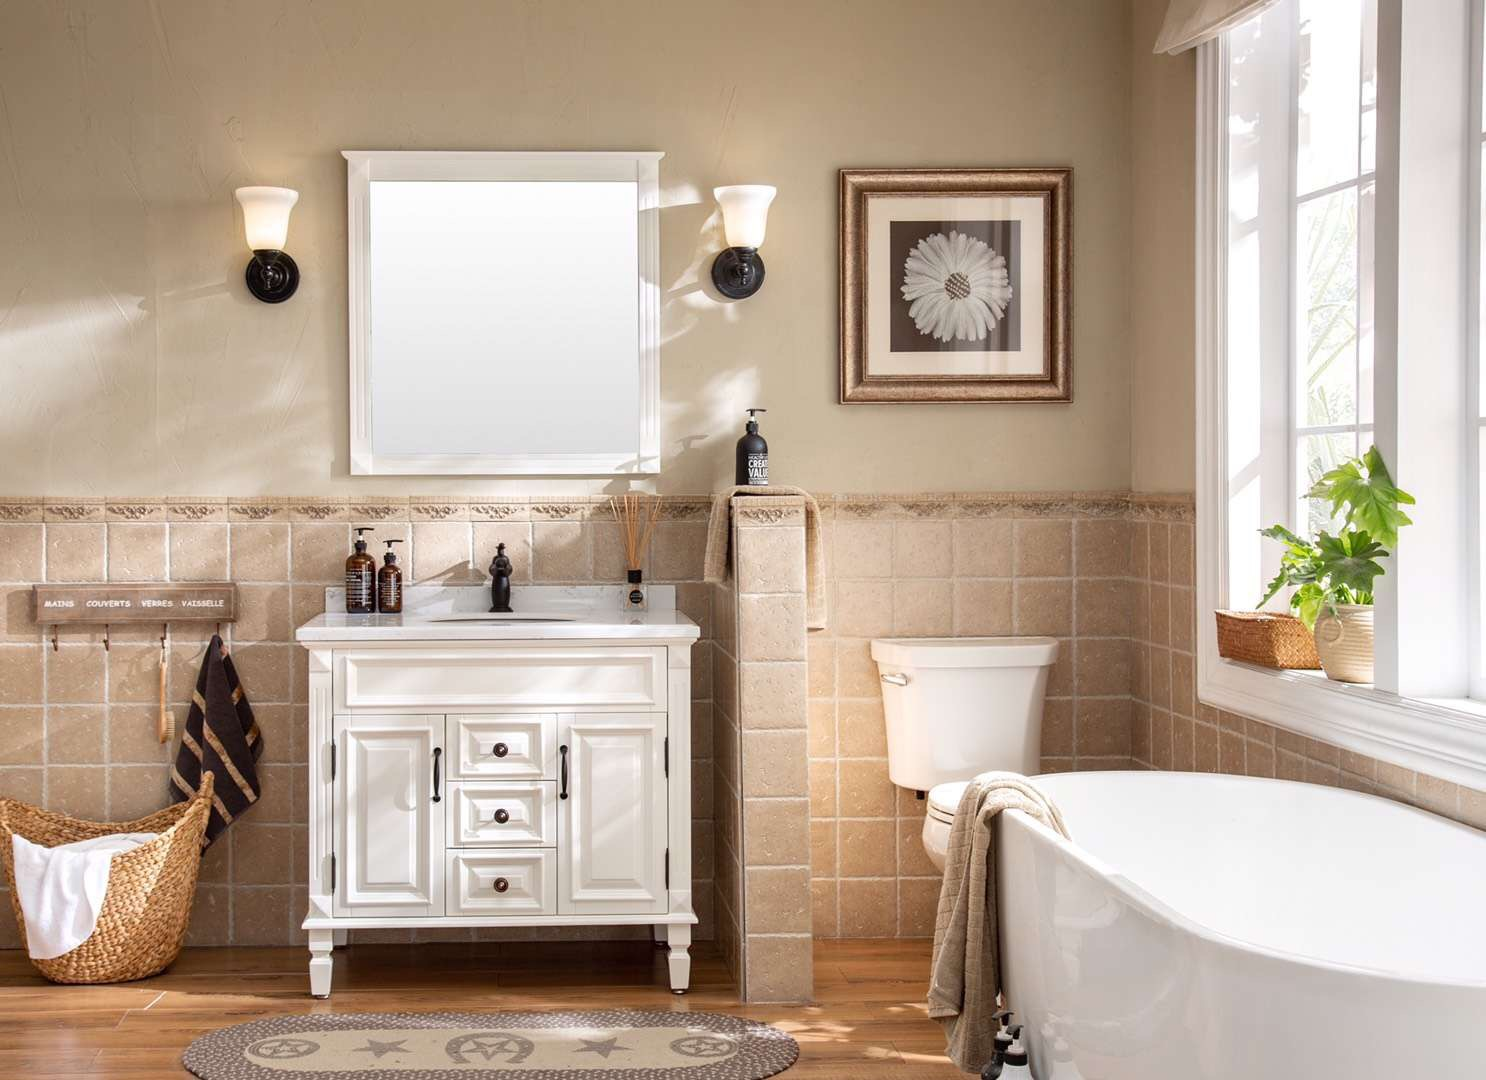 40inch solid wood light brown bathroom vanity with